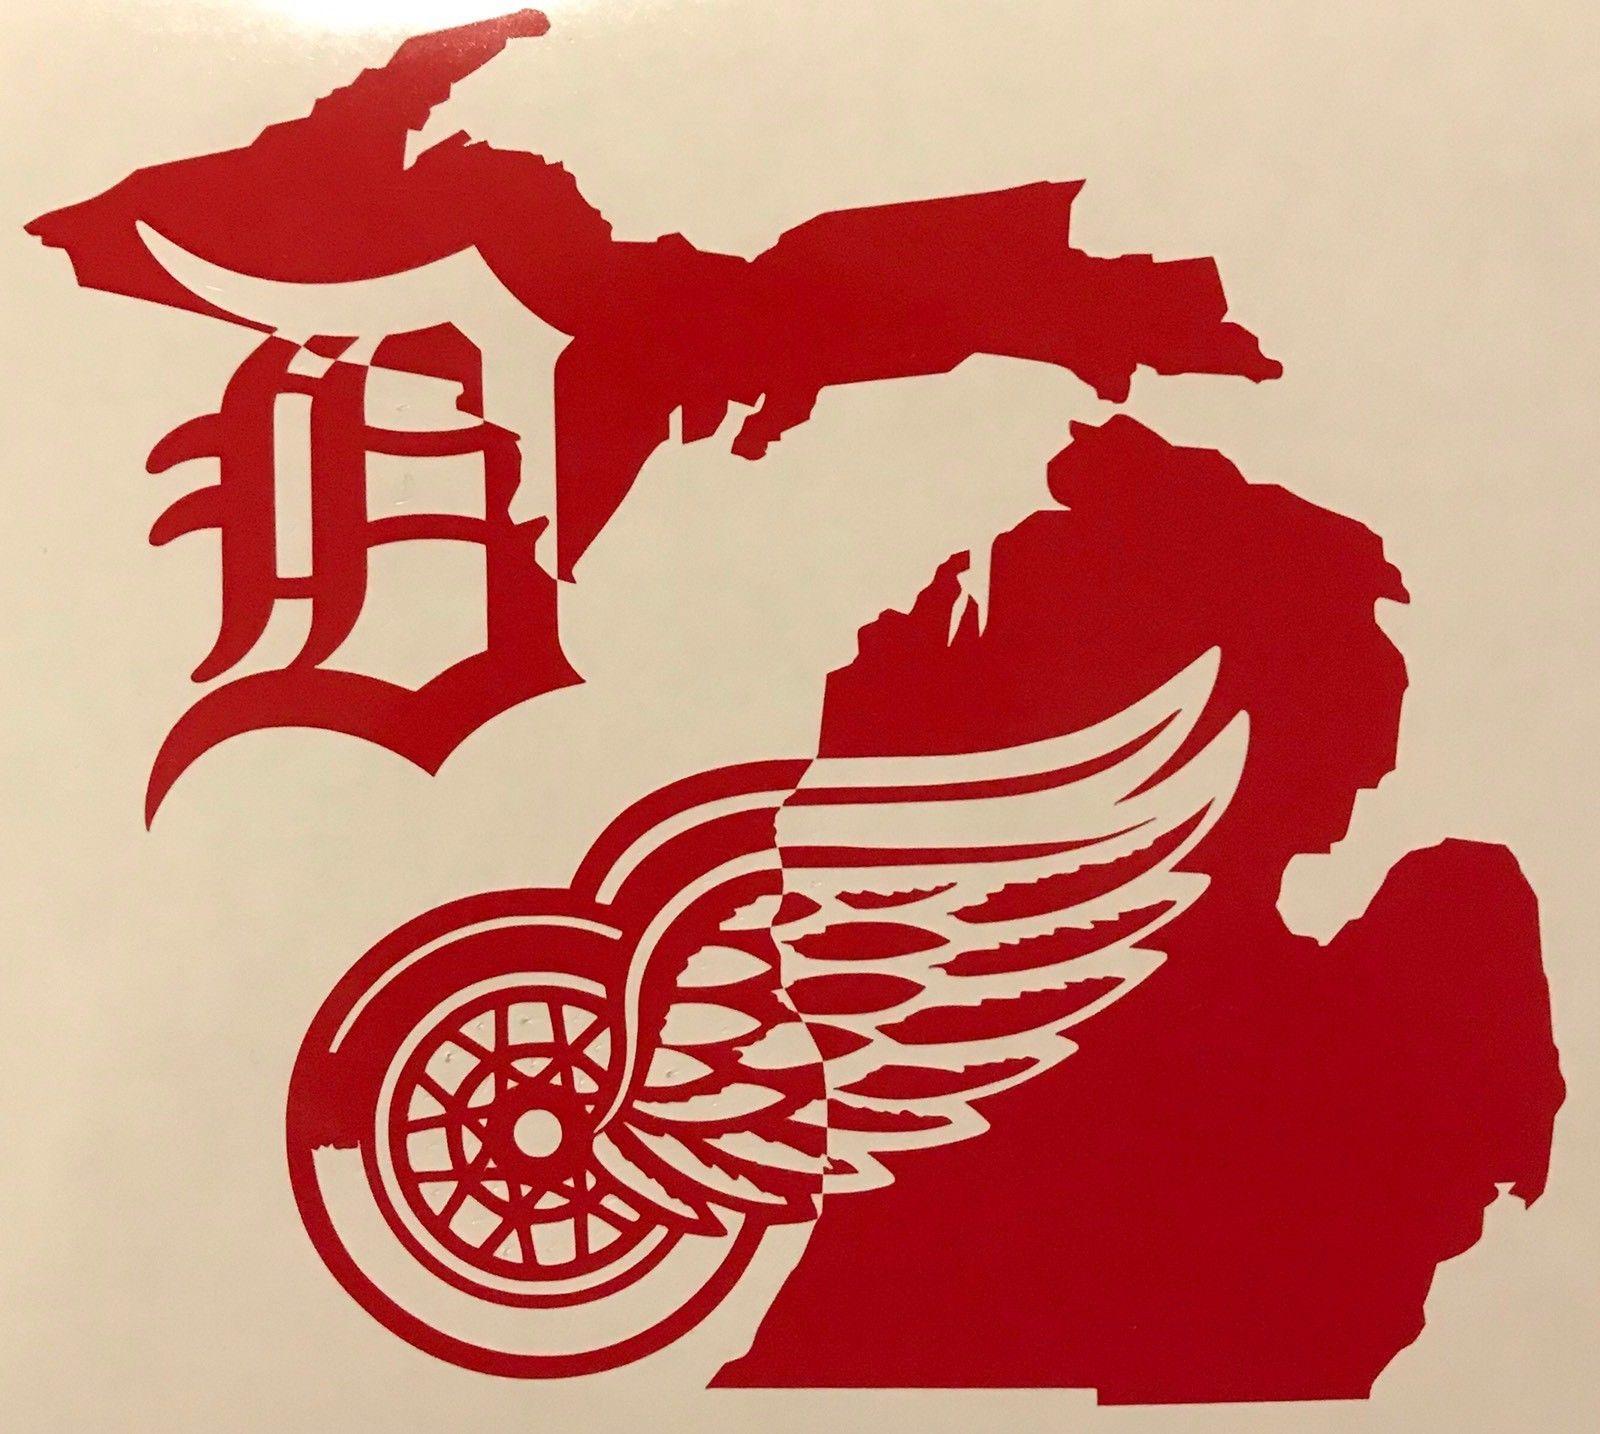 Detroit Red Wings Tigers Michigan Mitten Lca Yeti Cup Vinyl Decal Sticker Michigan Decal Michigan Sticker Vinyl Decals [ 1434 x 1600 Pixel ]